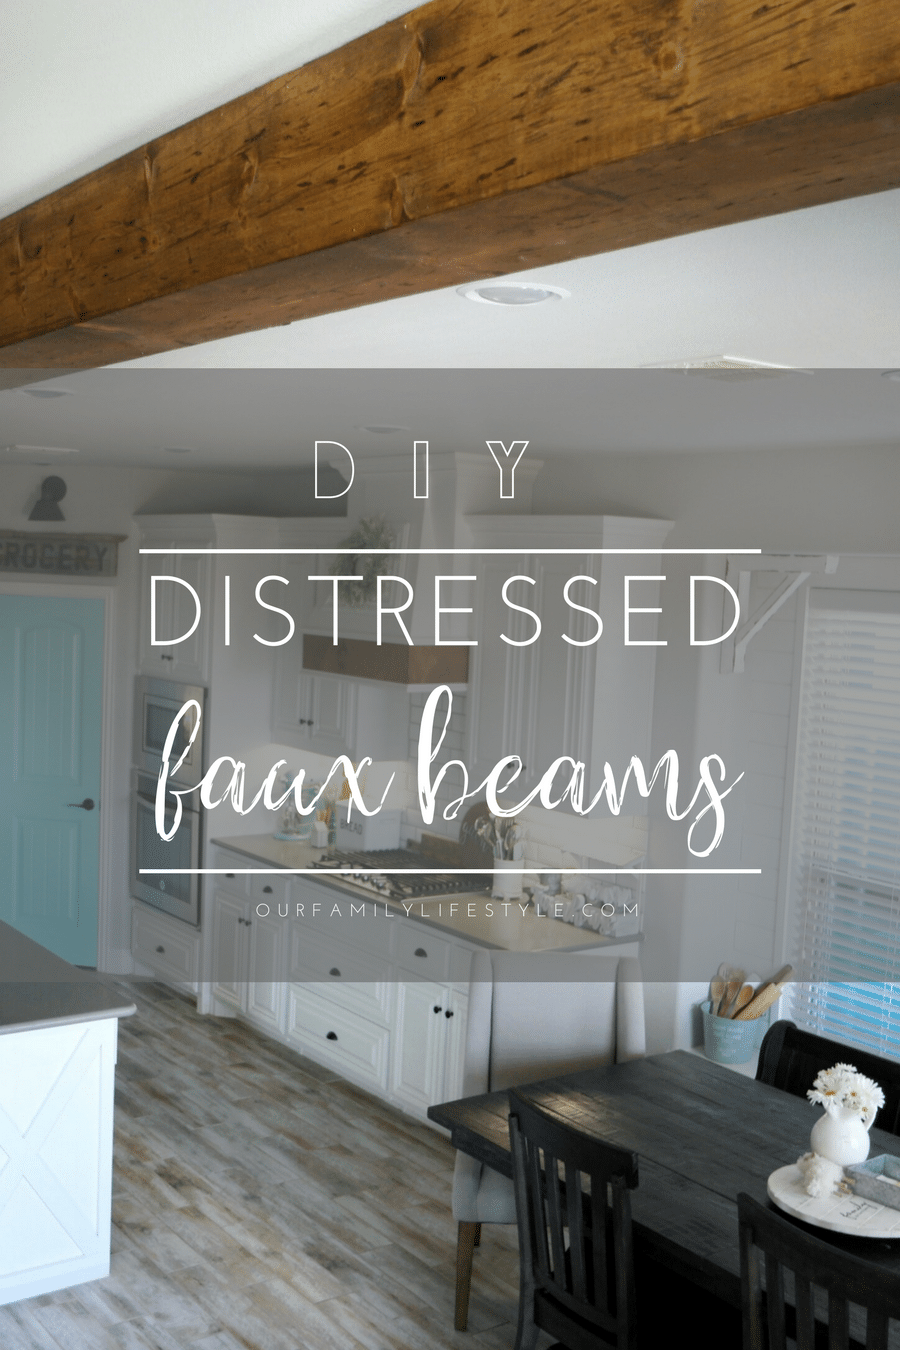 DIY Distressed Faux Beams